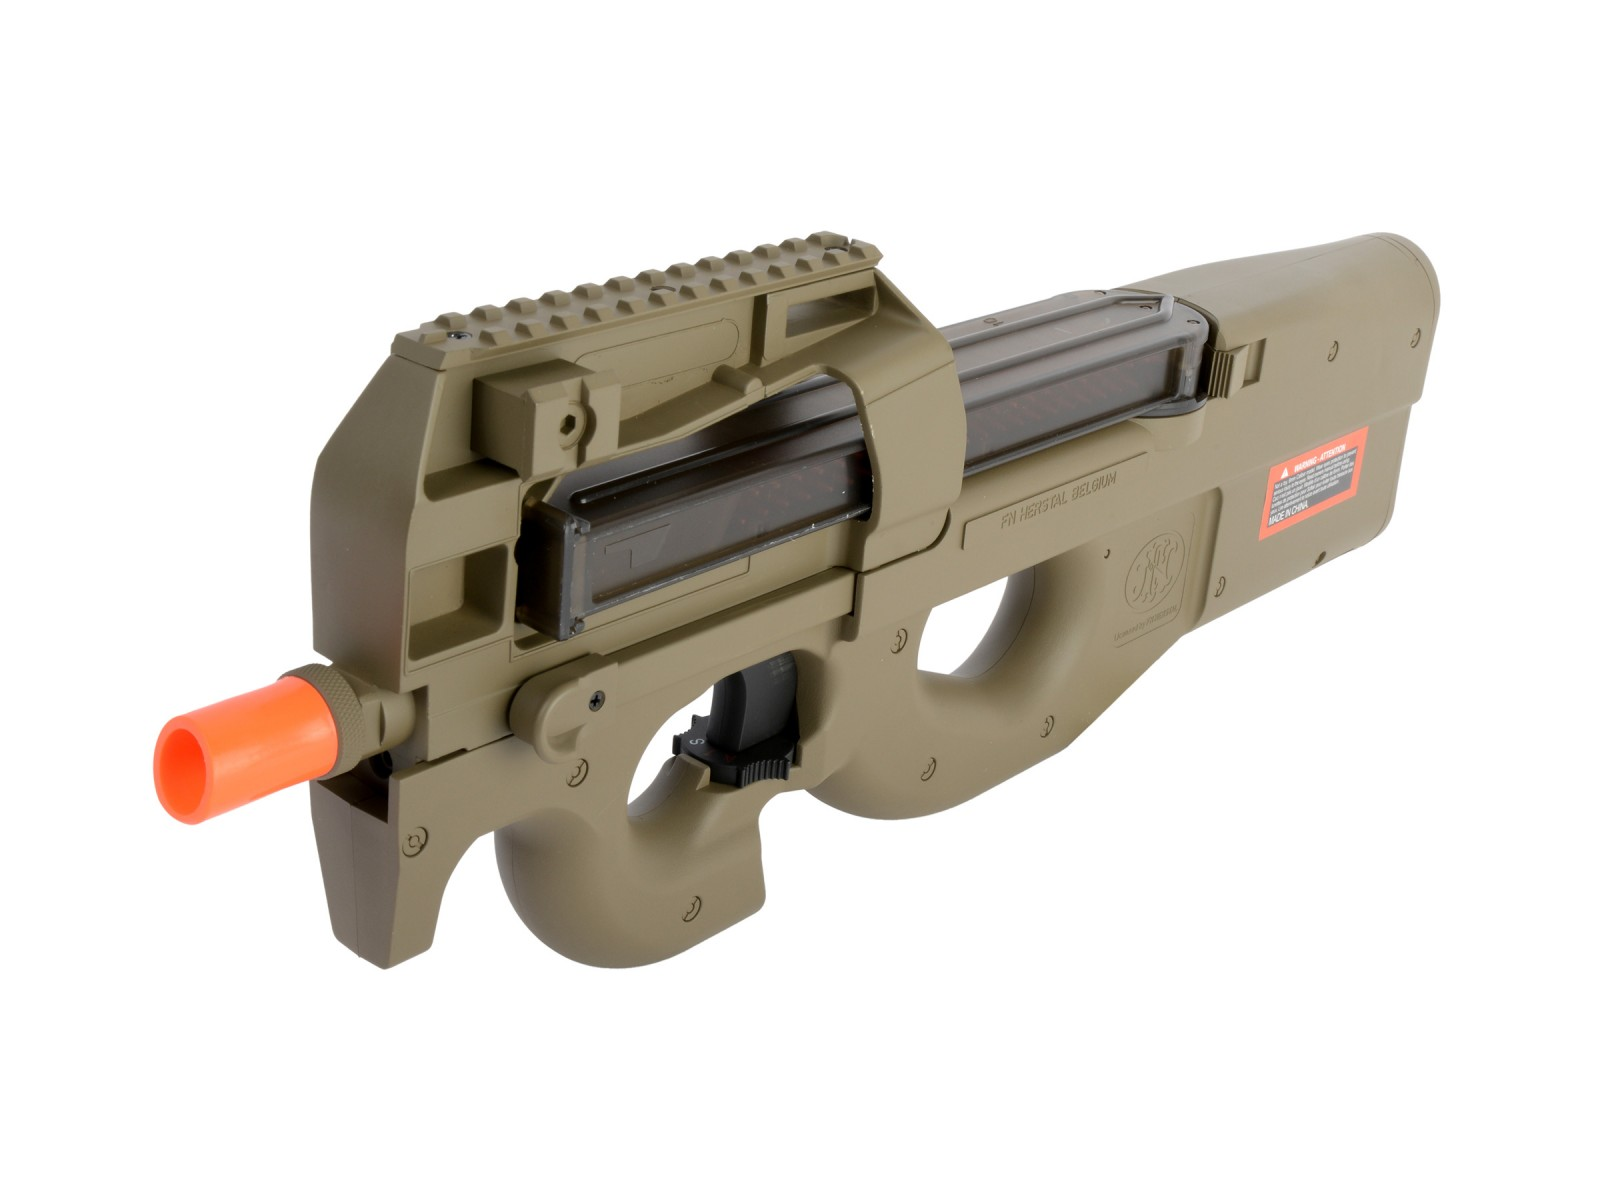 FN Herstal P90 AEG Electric Airsoft Rifle, Tan 6mm